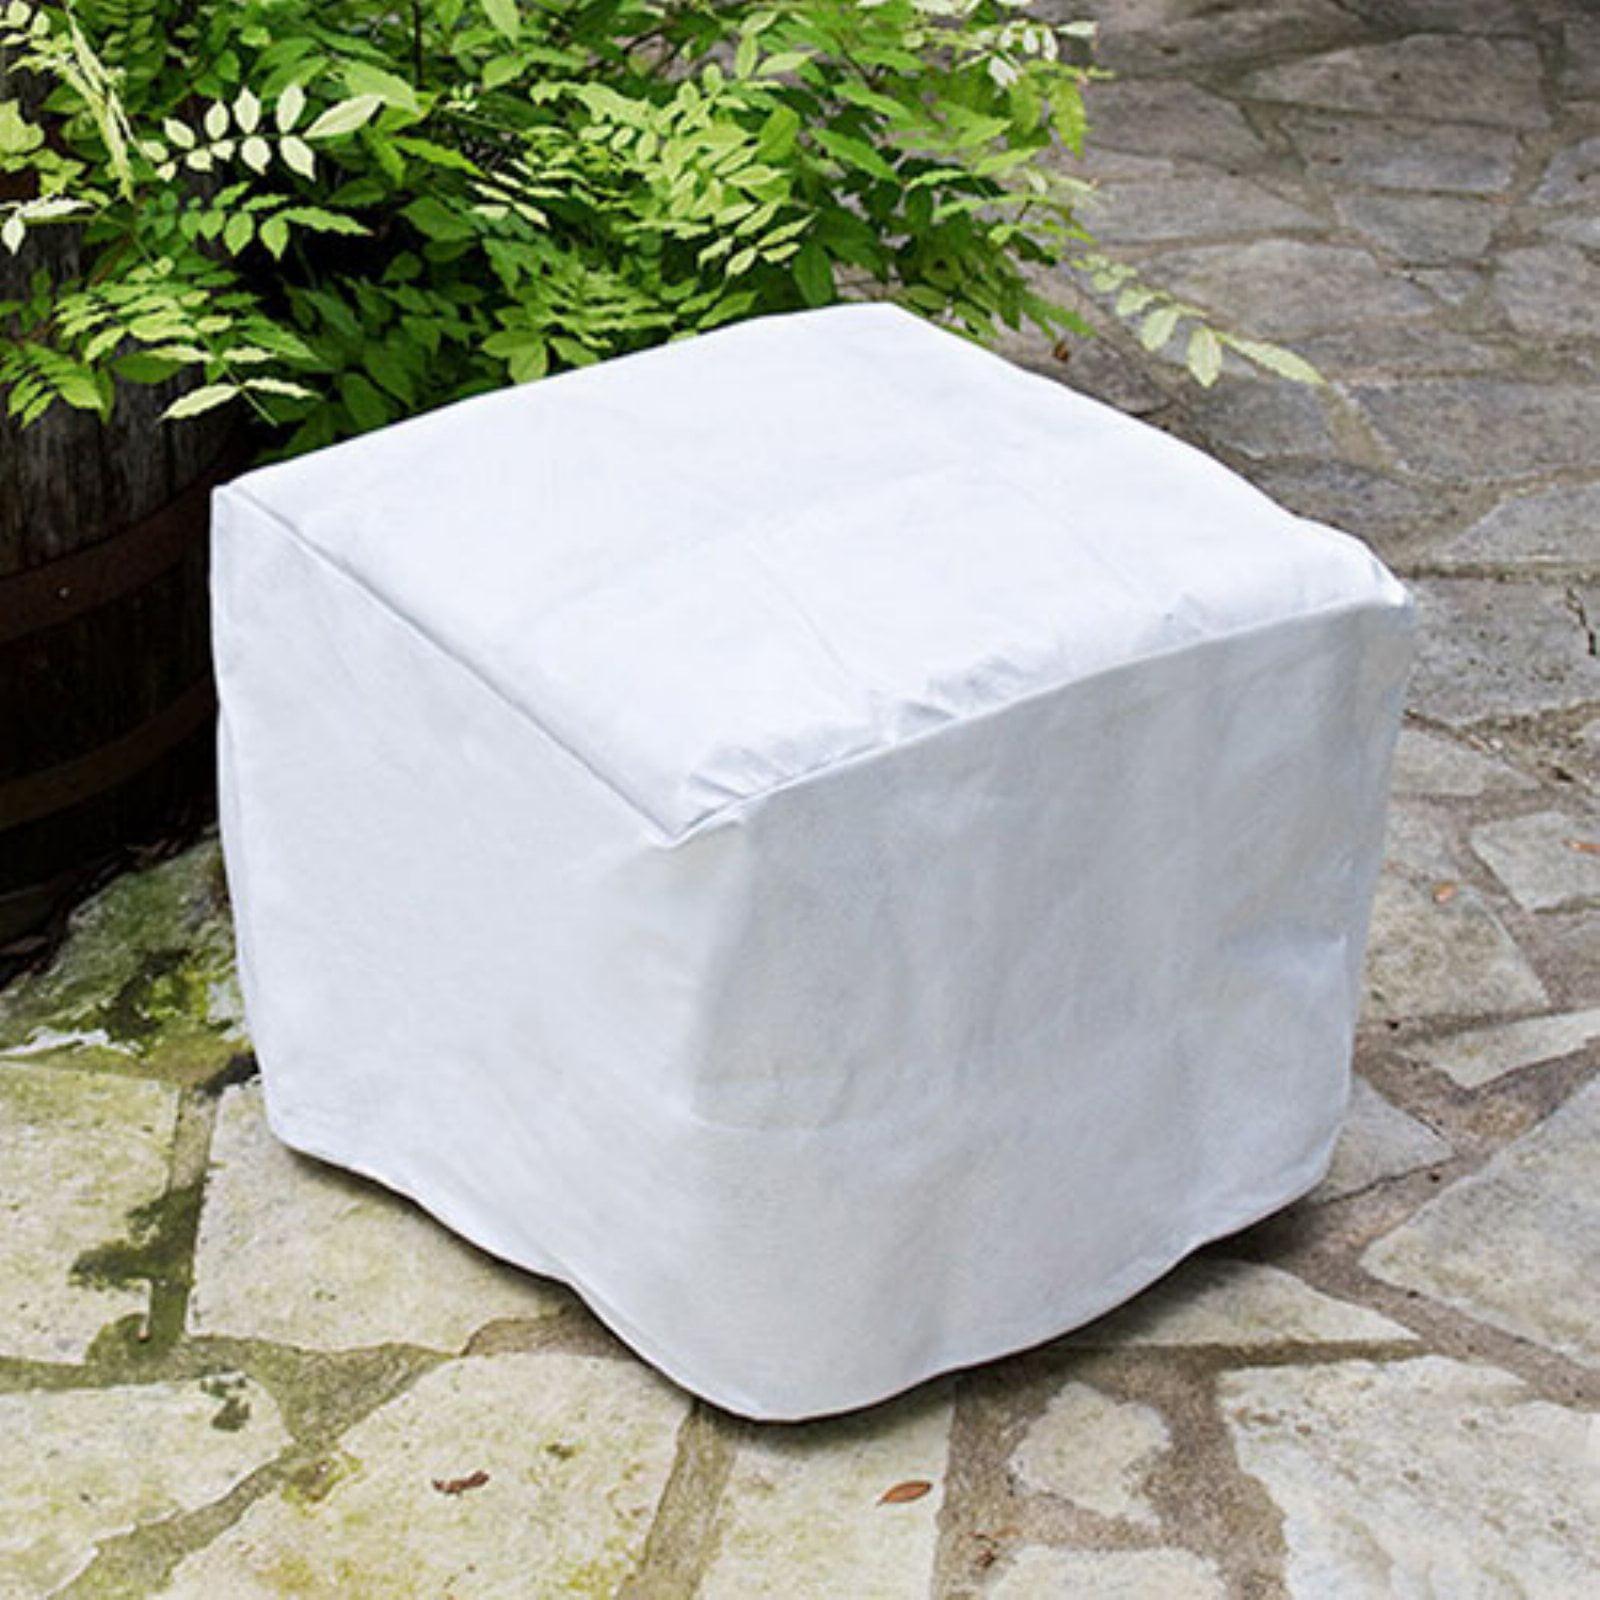 KoverRoos SupraRoos White Square Ottoman / Small Table Cover